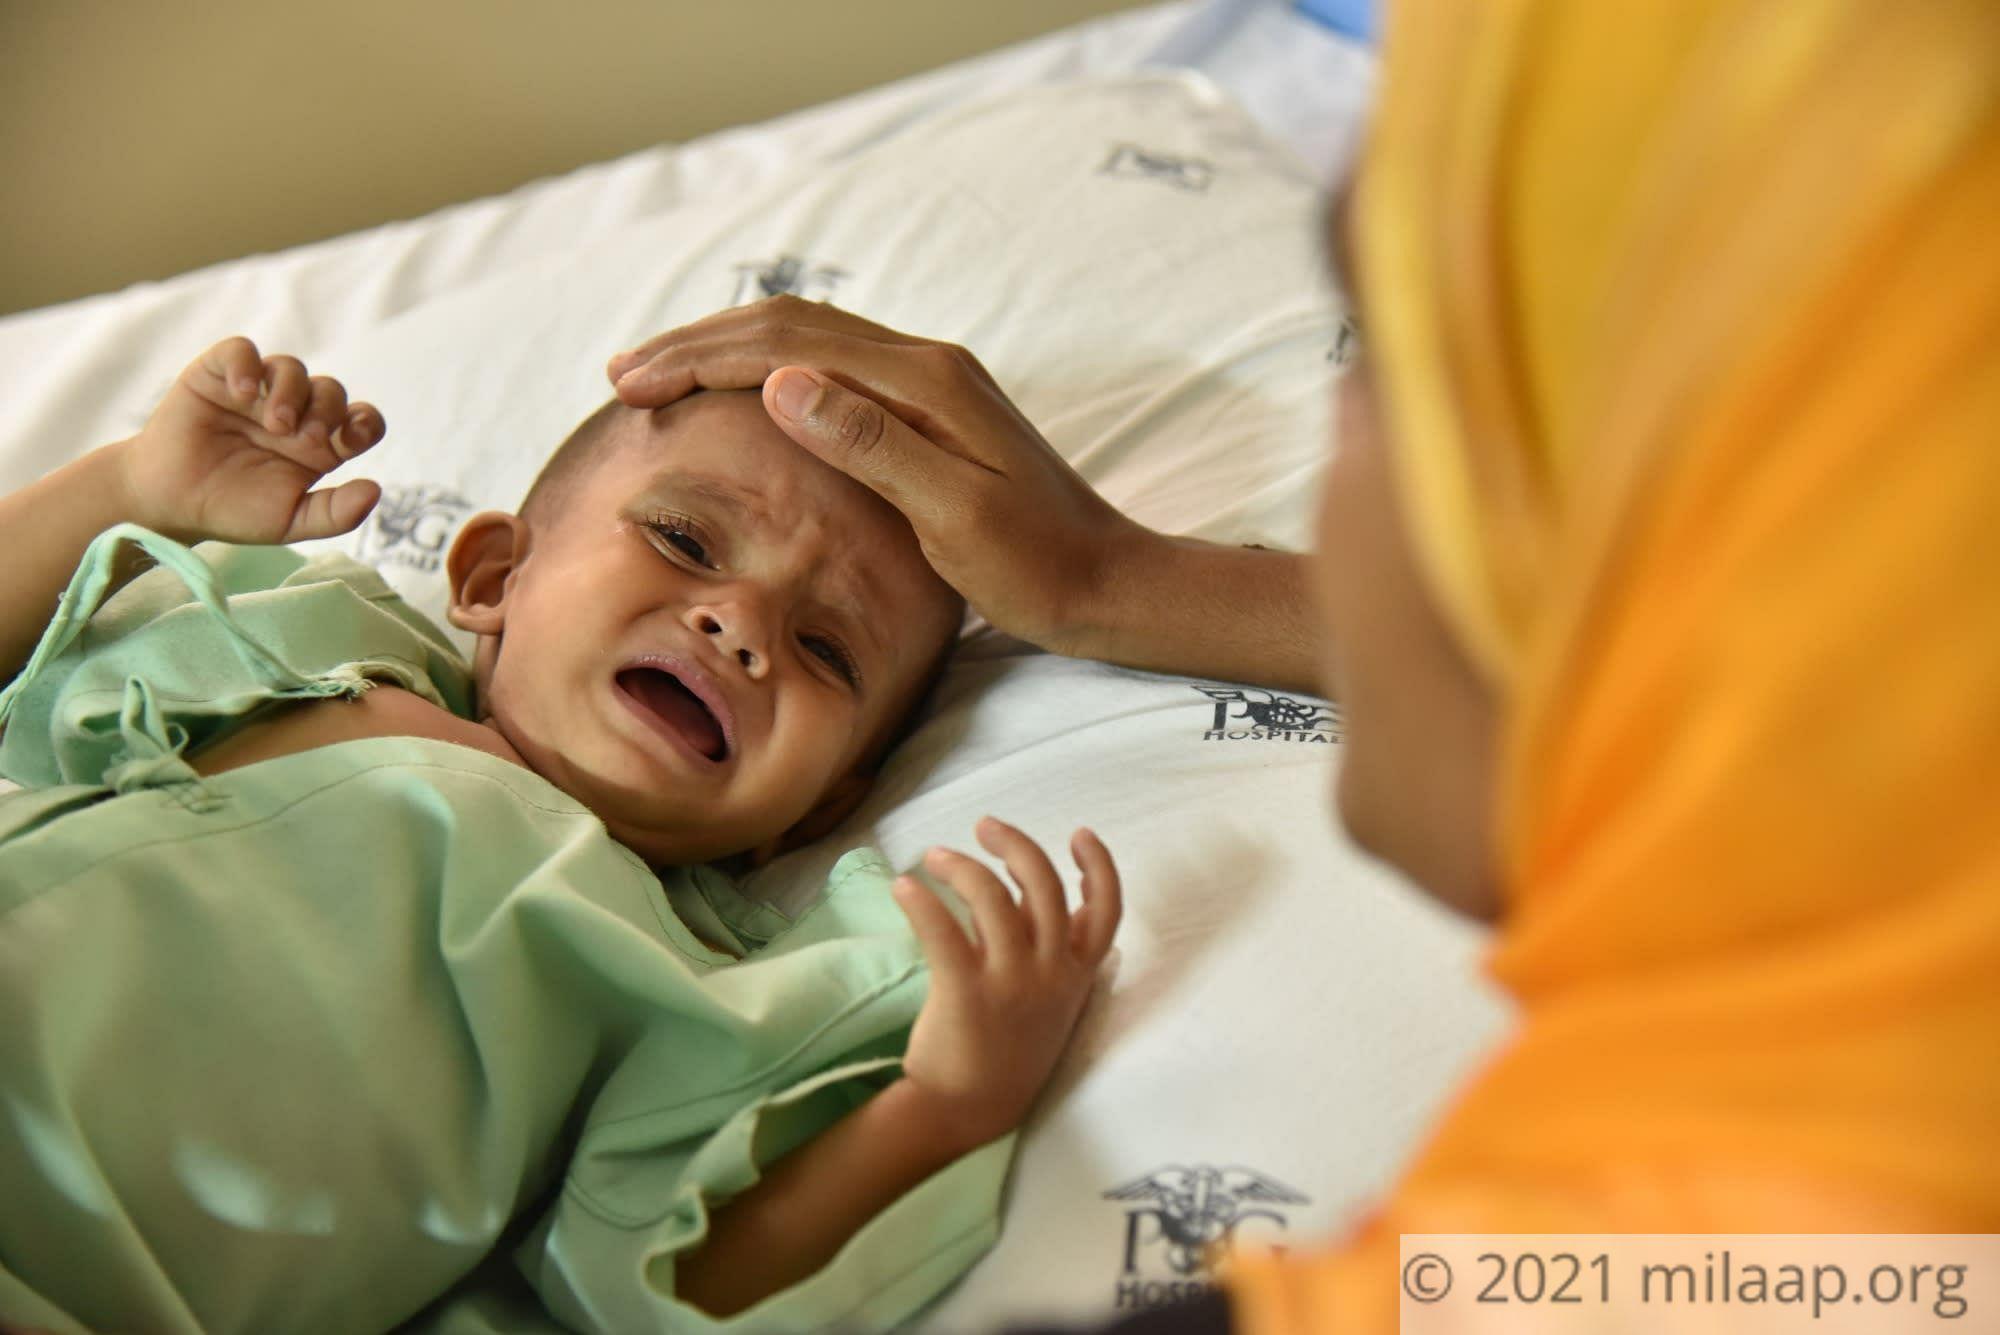 Thahani   psh hospital   coimbatore 13 qphaj7 1621522510